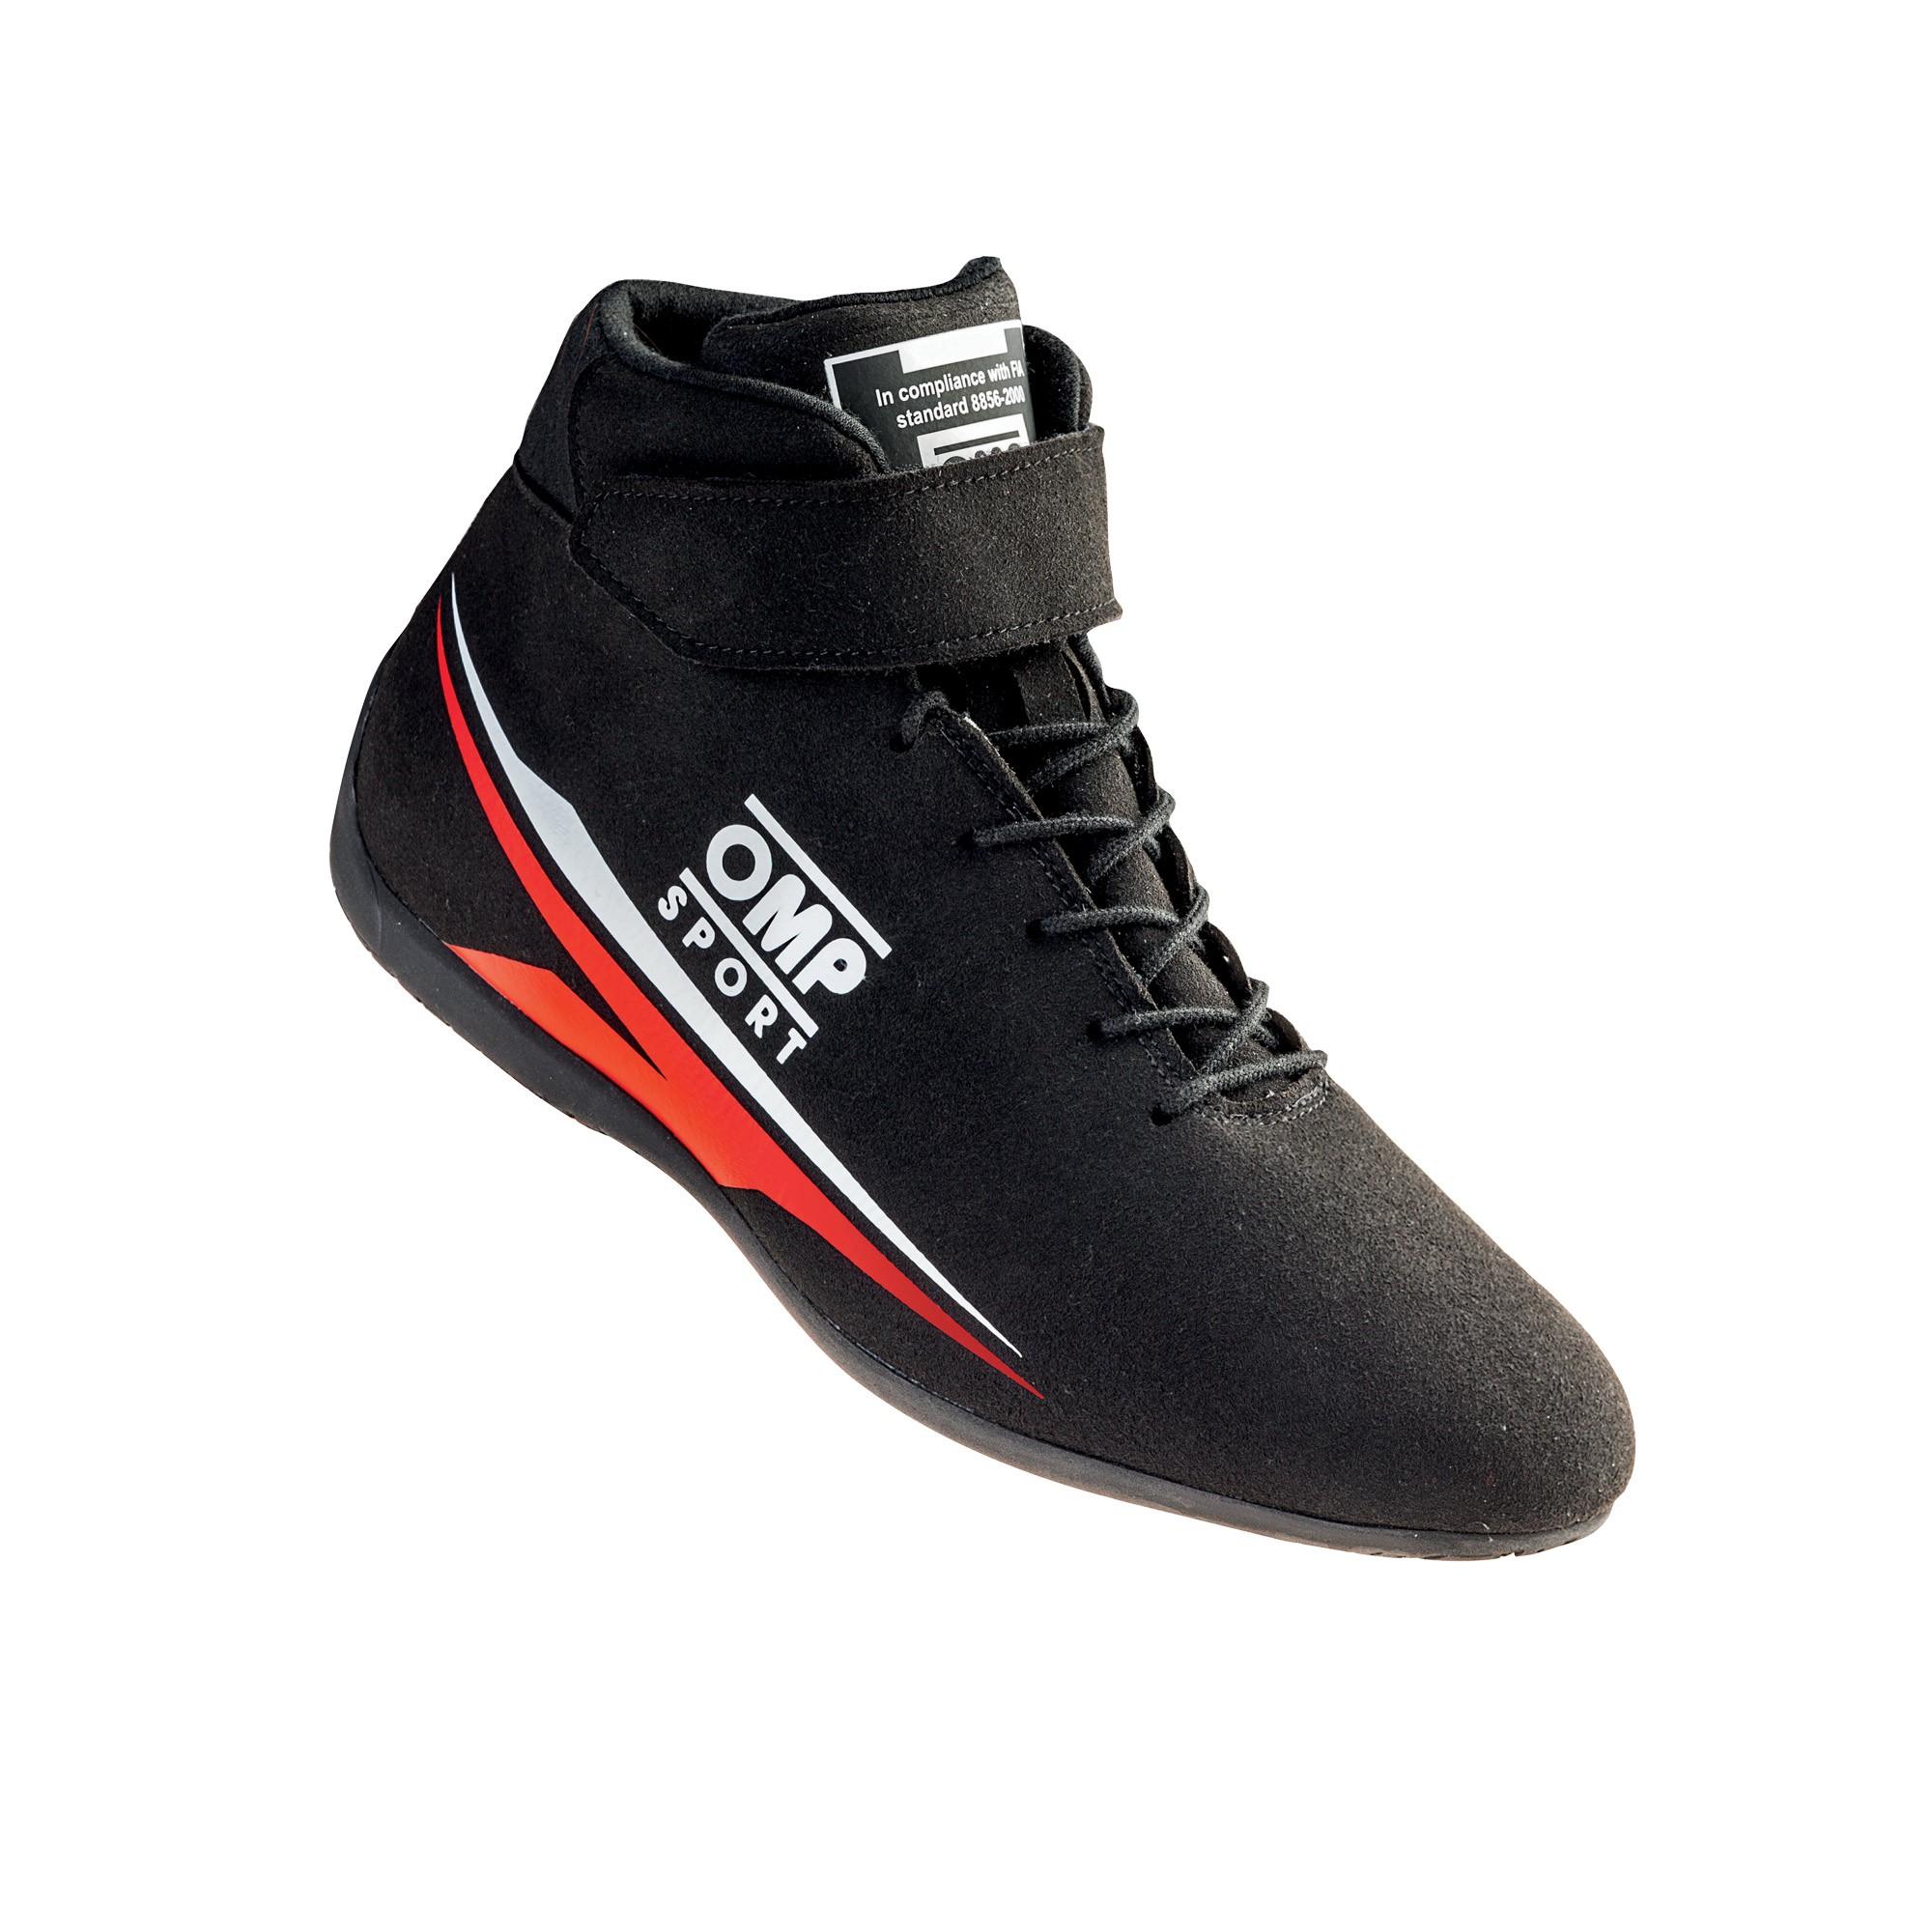 7f6733ffc5a OMP Sport Shoes my2018